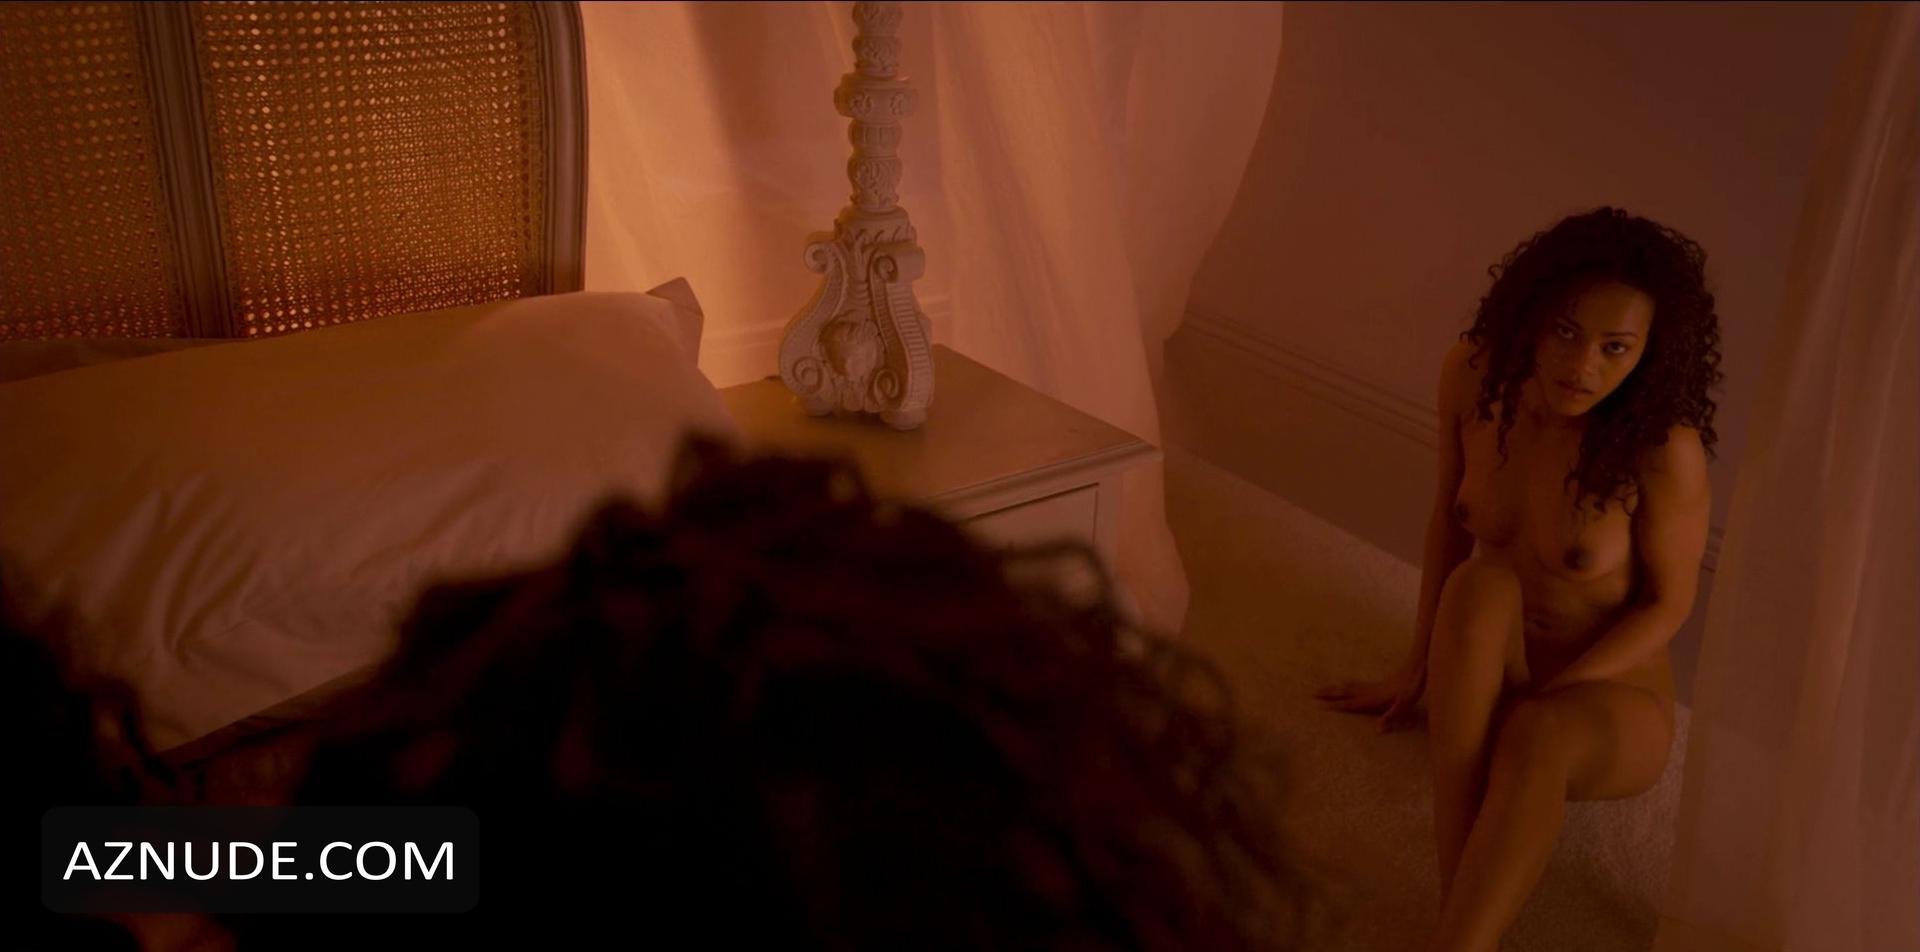 Boobs Black Mirror Nude Scenes Pic